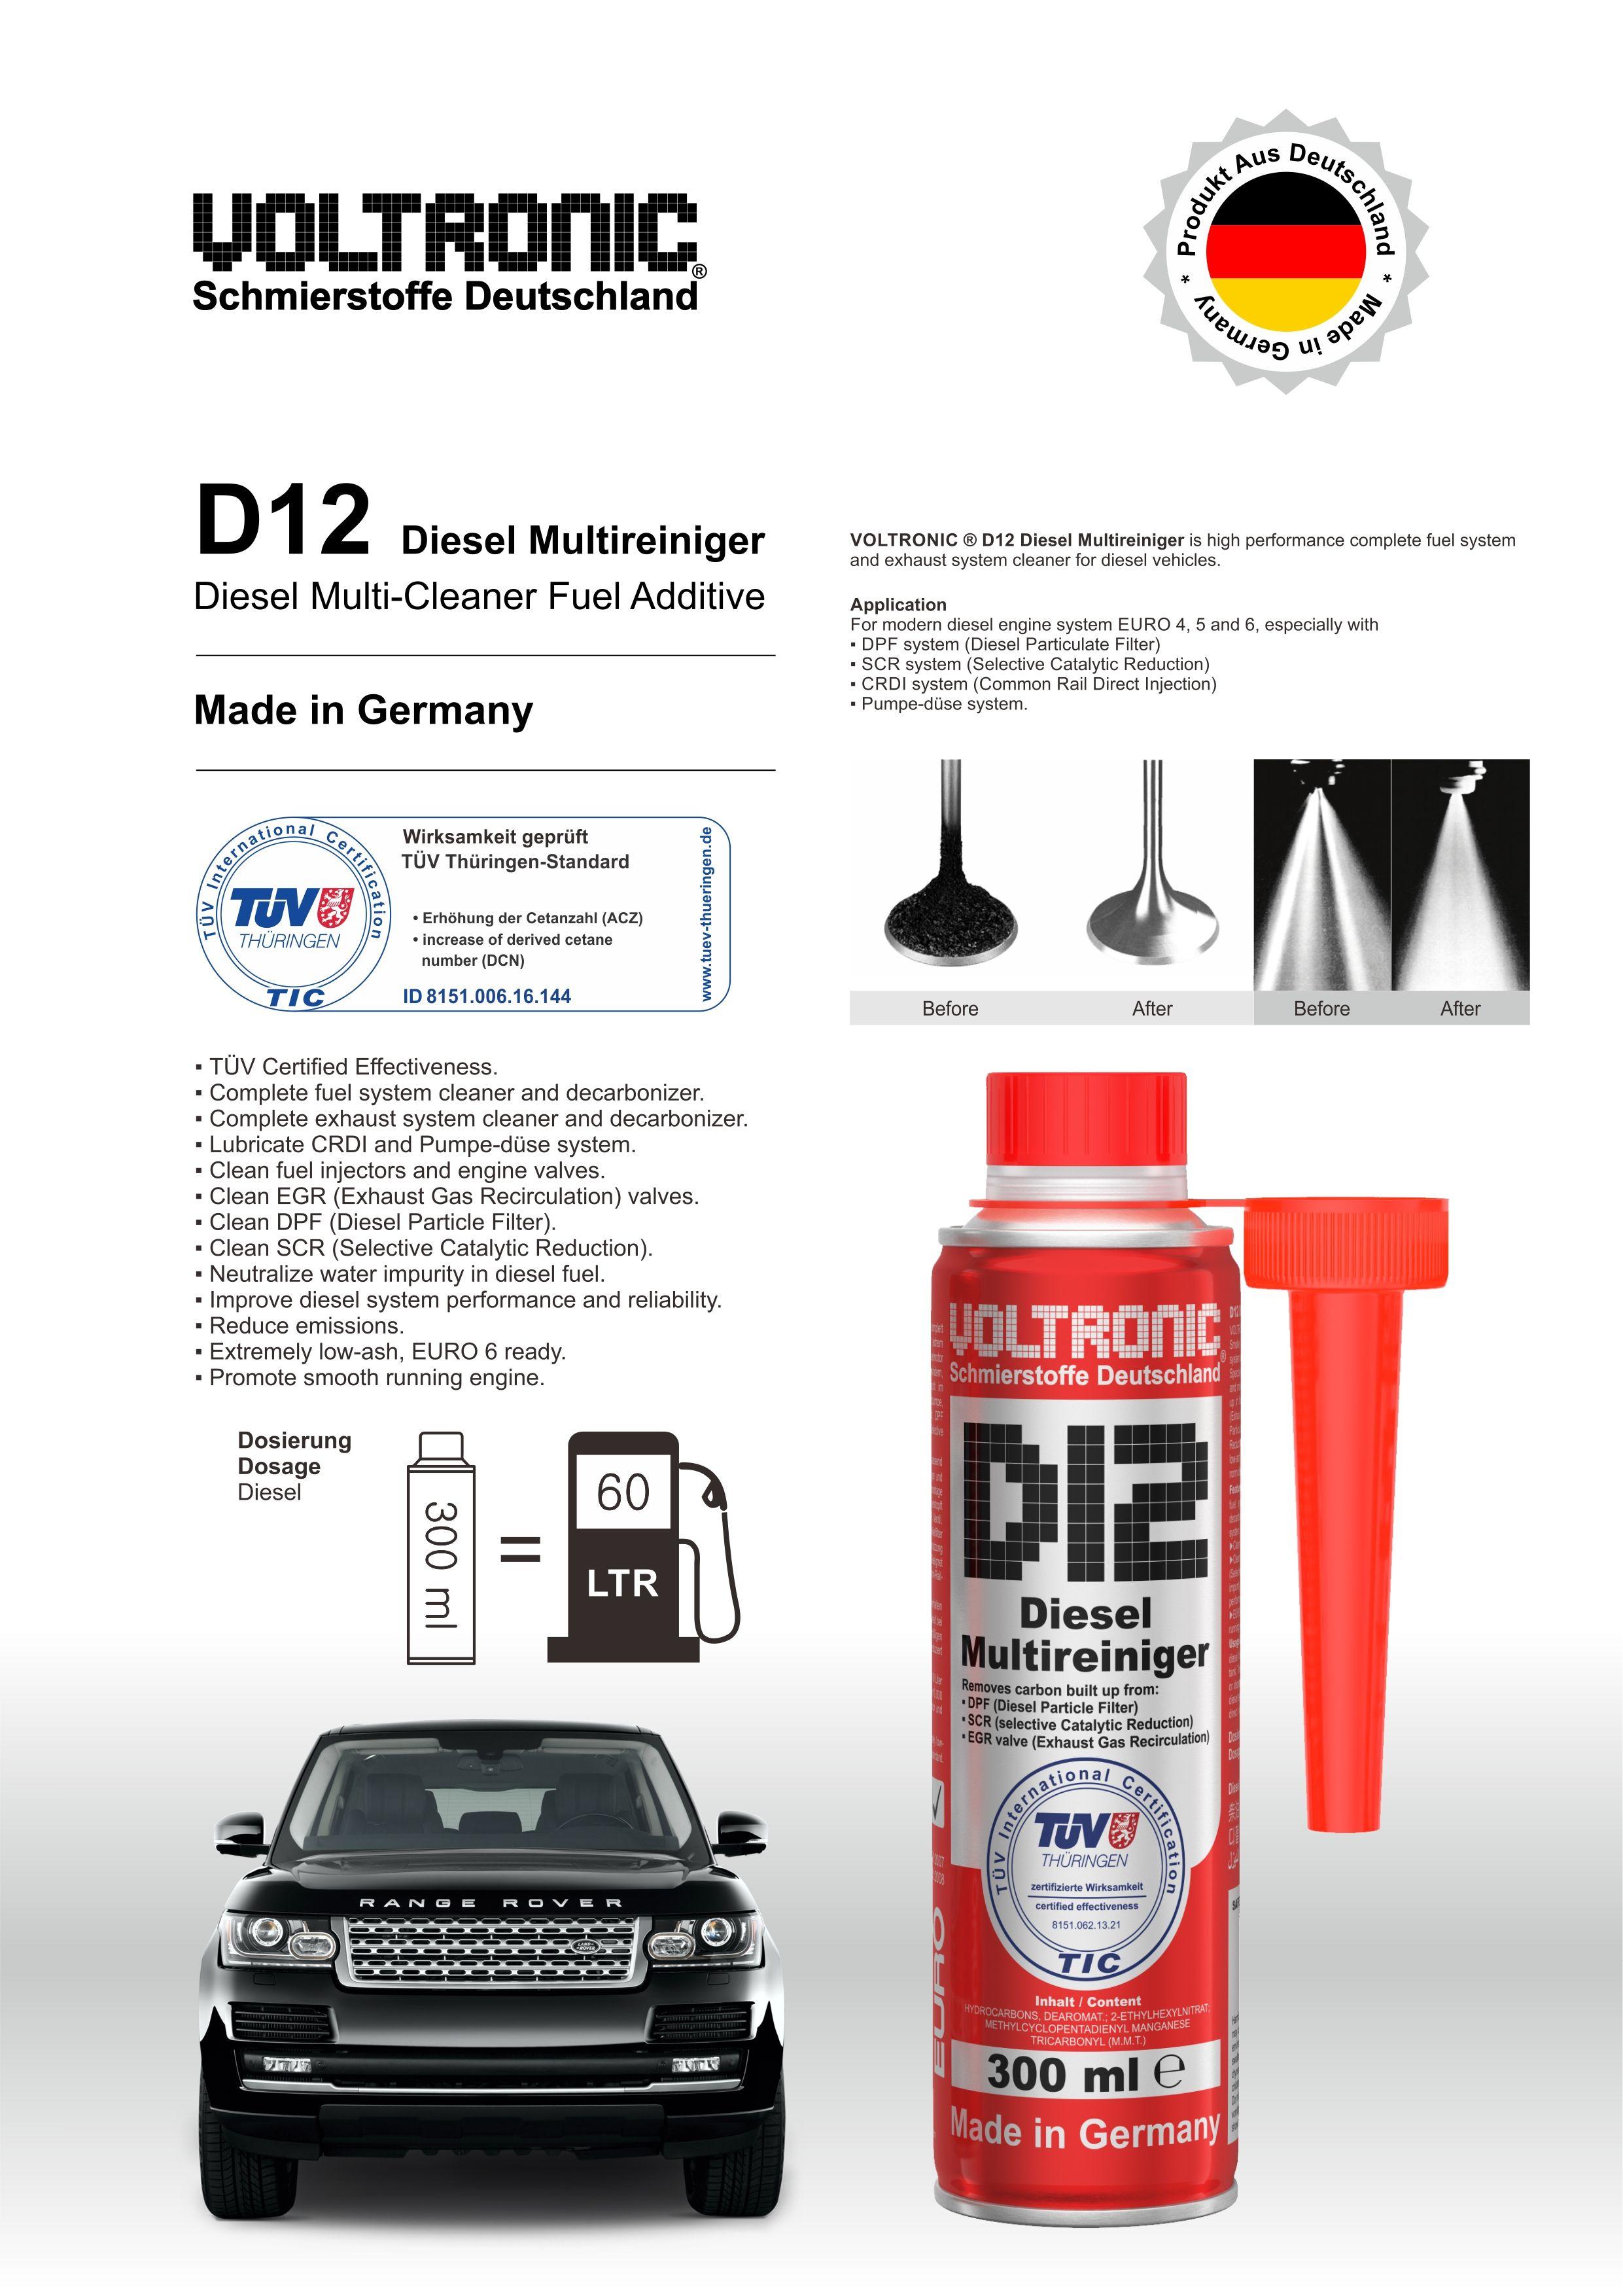 Voltronic D12 Diesel Multireiginer Multi Cleaner Fuel Additive Diesel Fuel Additives Reviews